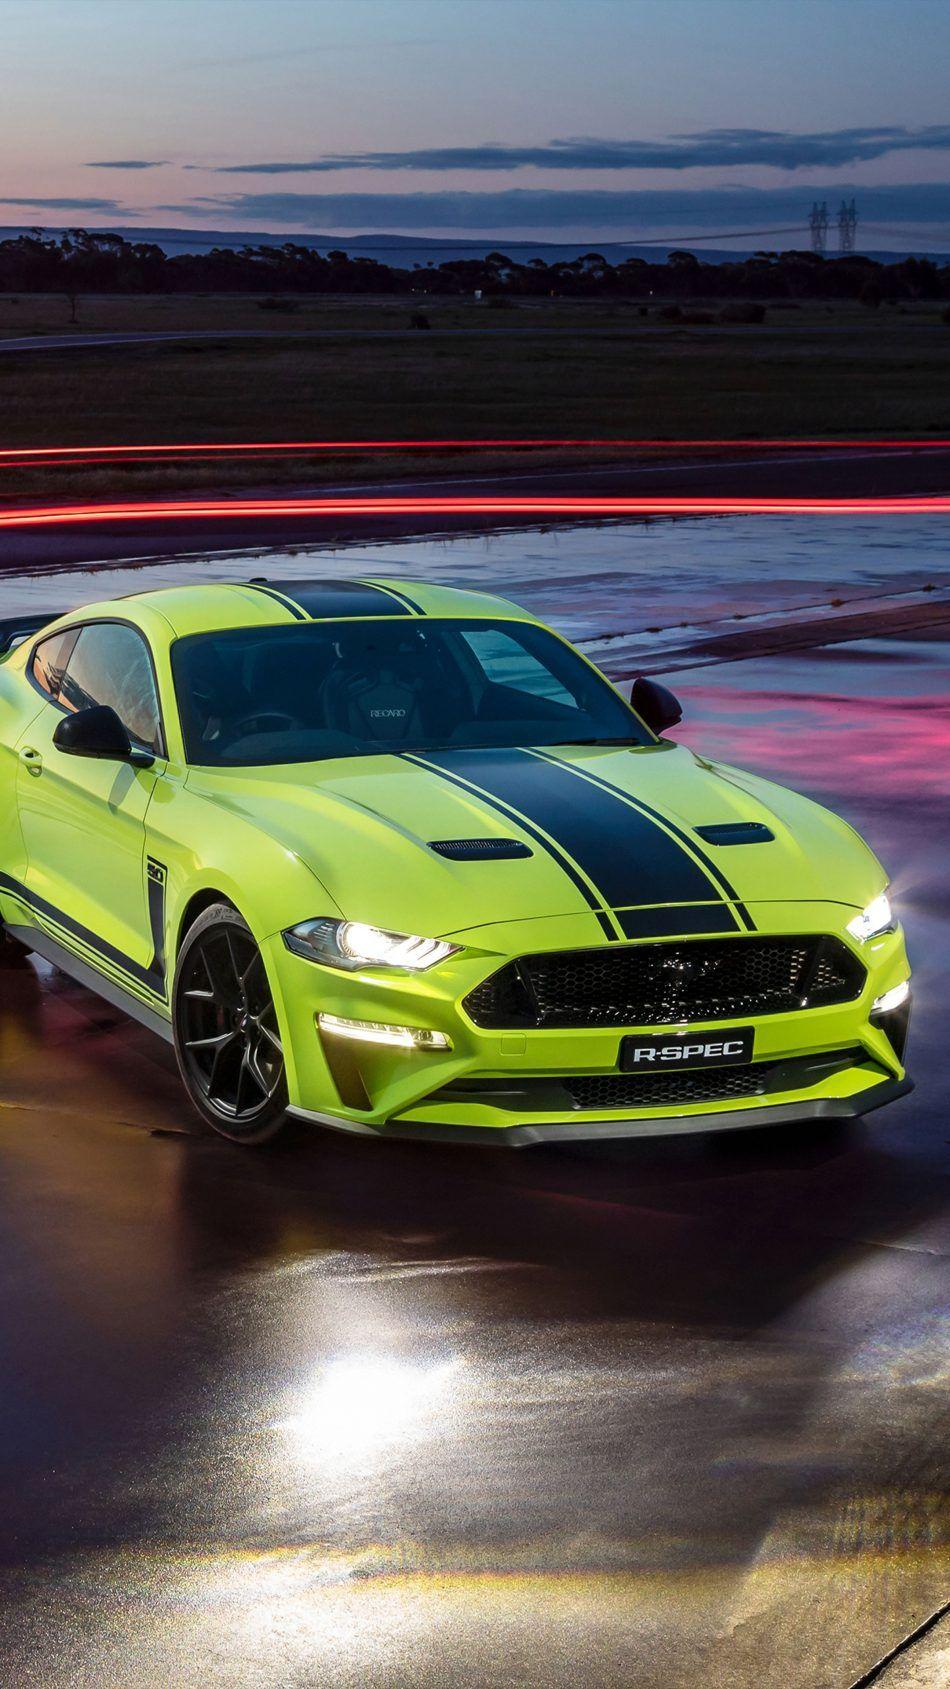 Ford Mustang Gt Fastback R Spec 2019 4k Ultra Hd Mobile Wallpaper Ford Mustang Gt Ford Mustang Mustang Gt